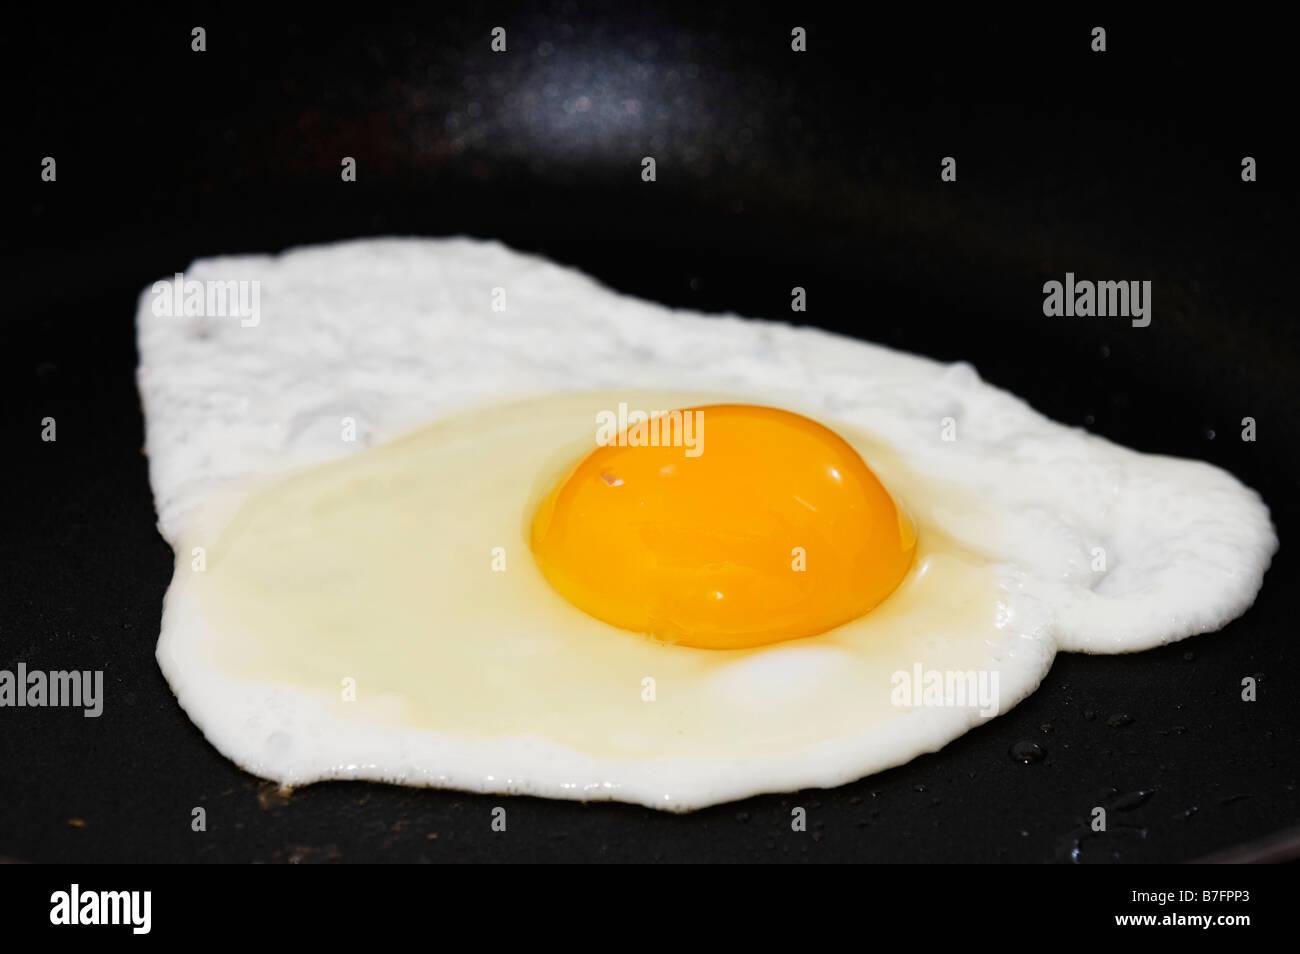 food fried egg on teflon pane - Stock Image